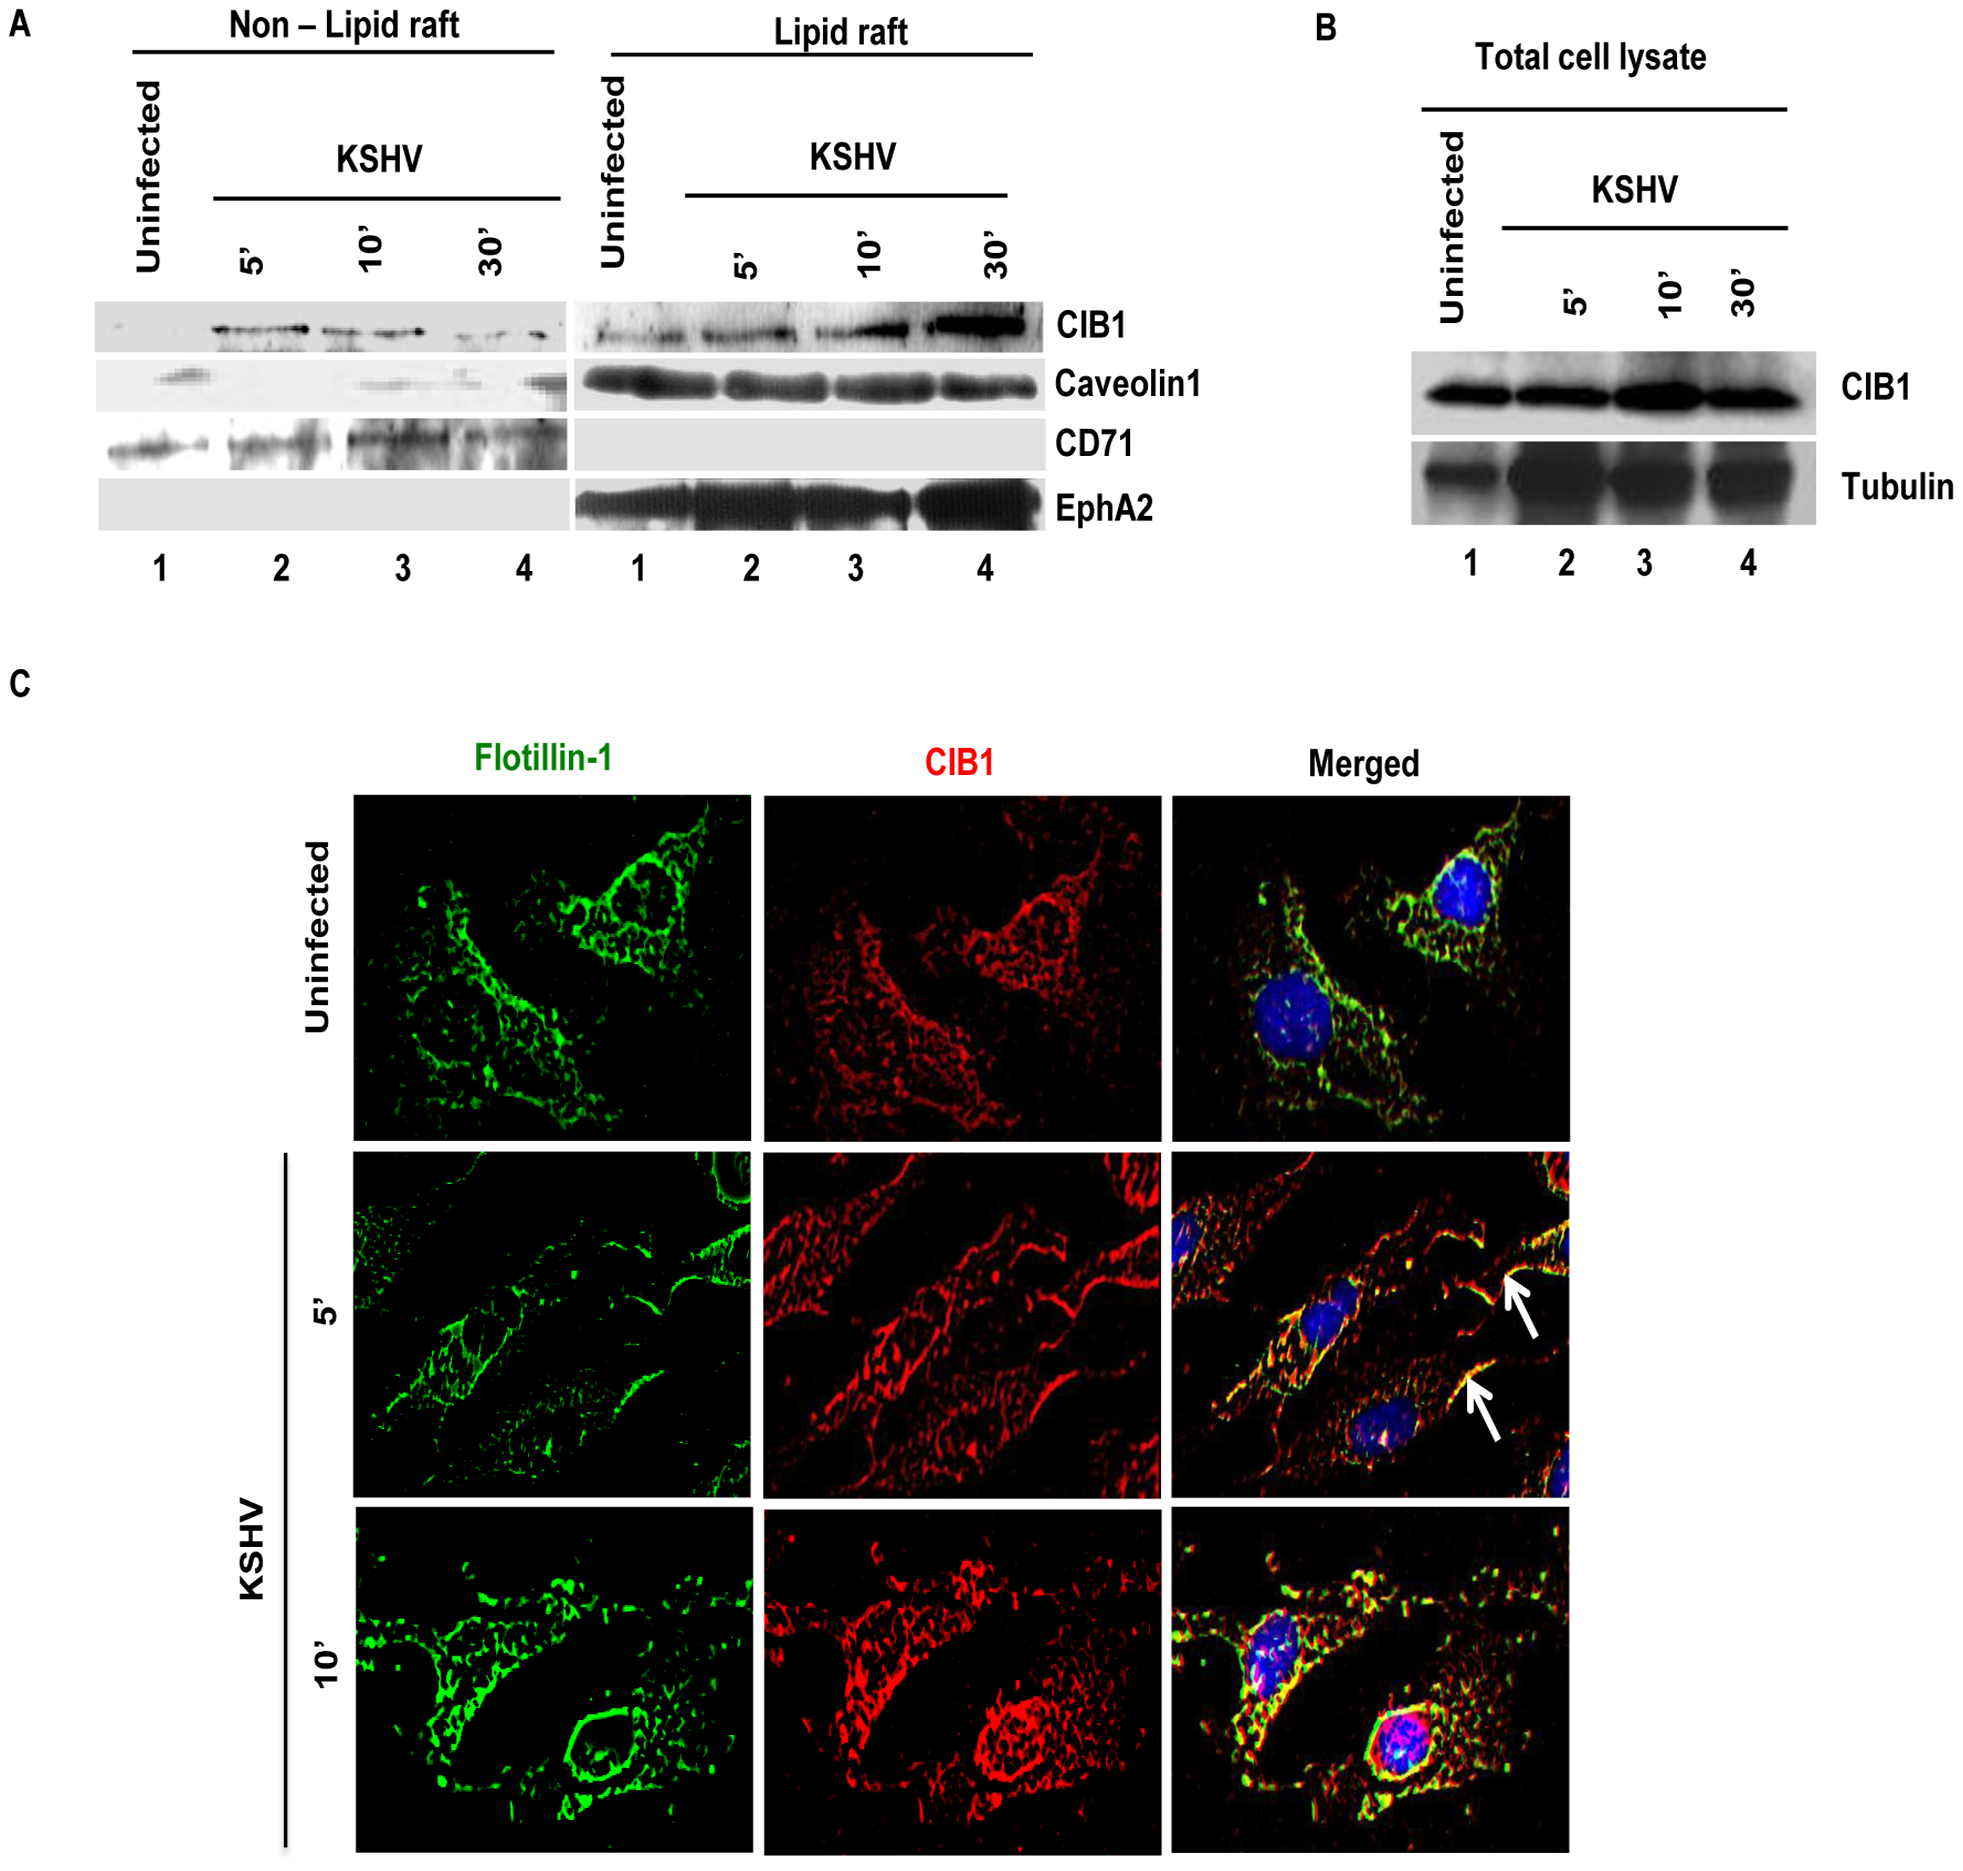 CIB1 association with membrane lipid rafts of HMVEC-d cells early during <i>de novo</i> KSHV infection.